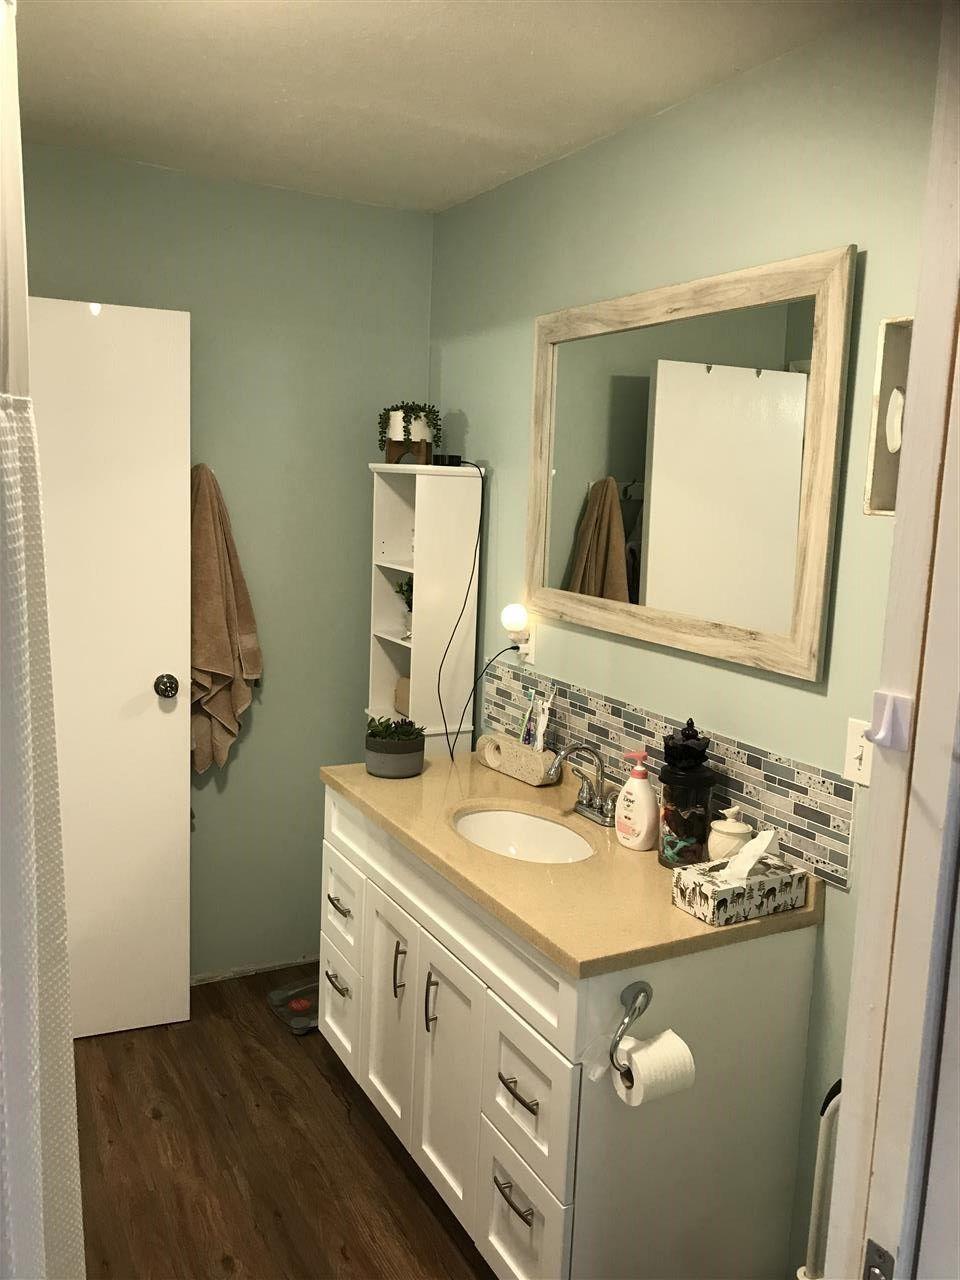 Photo 15: Photos: 10516 113 Avenue in Fort St. John: Fort St. John - City NW House for sale (Fort St. John (Zone 60))  : MLS®# R2535649